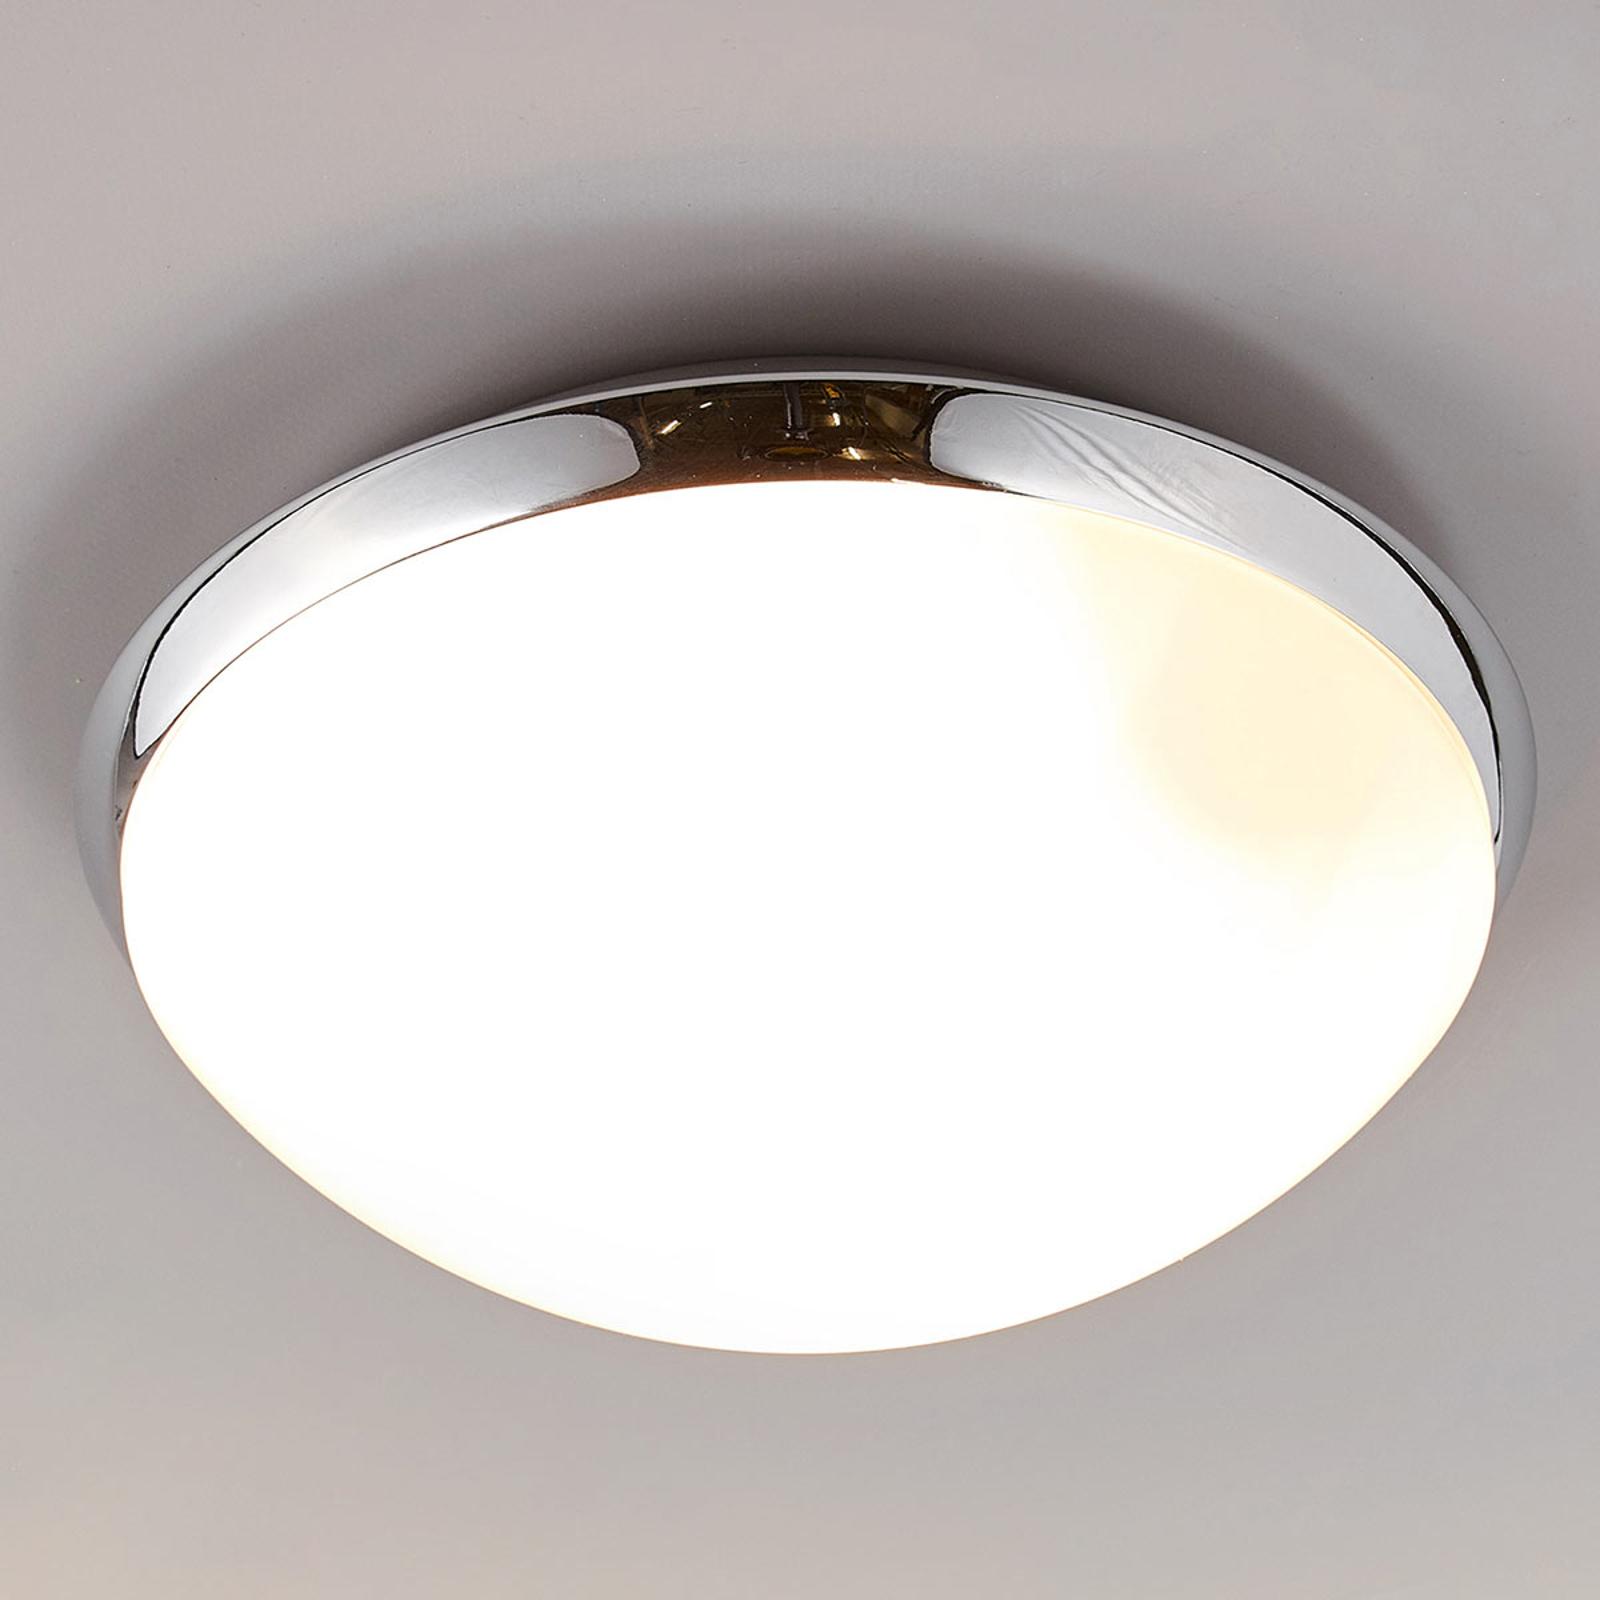 Badkamerplafondlamp Mijo met chroomrand, IP44